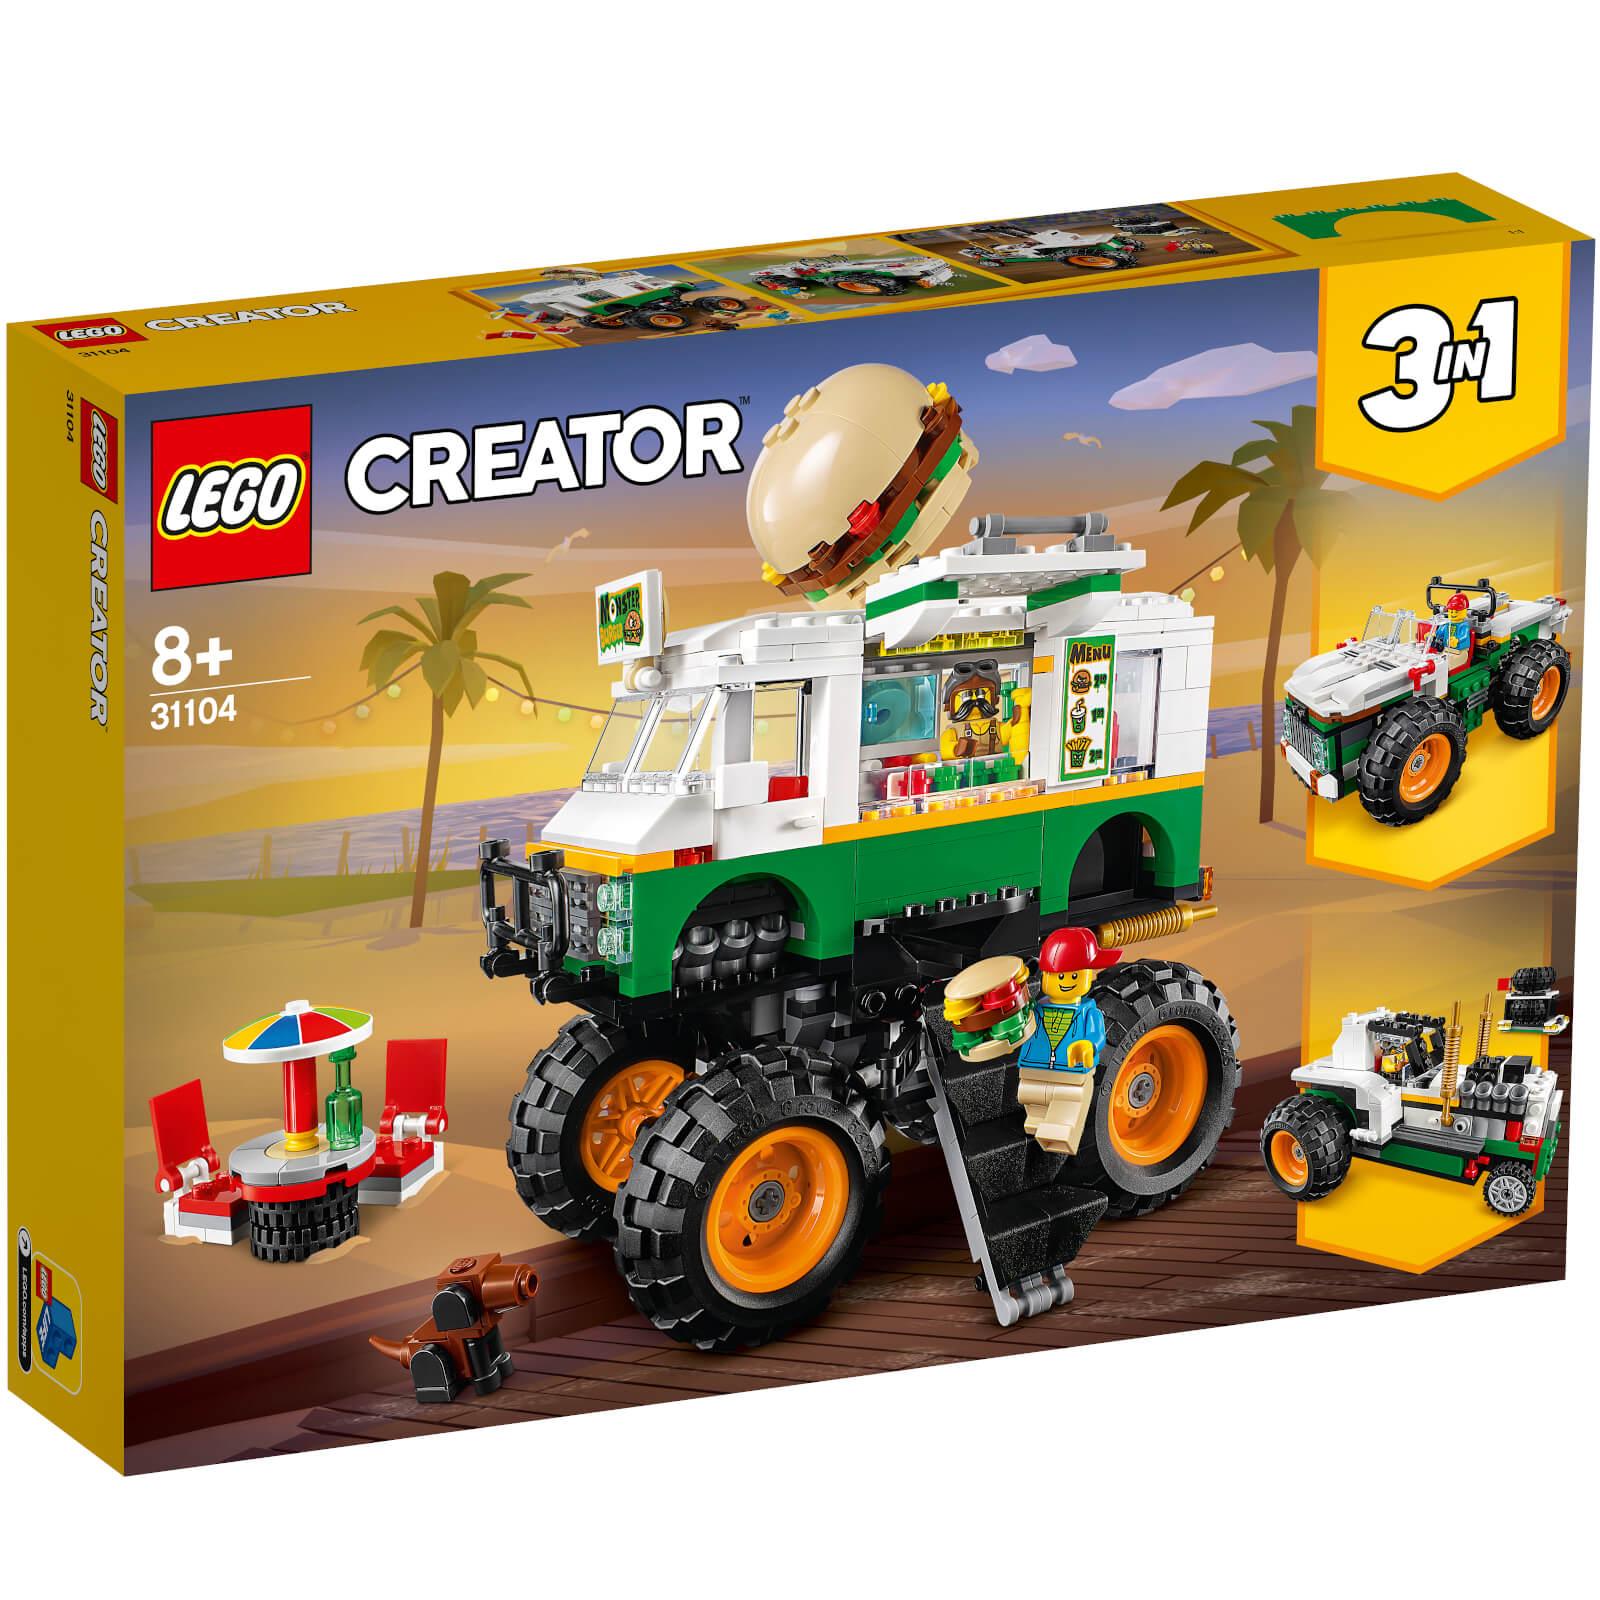 Lego Creator: Monster Burger Truck (31104)